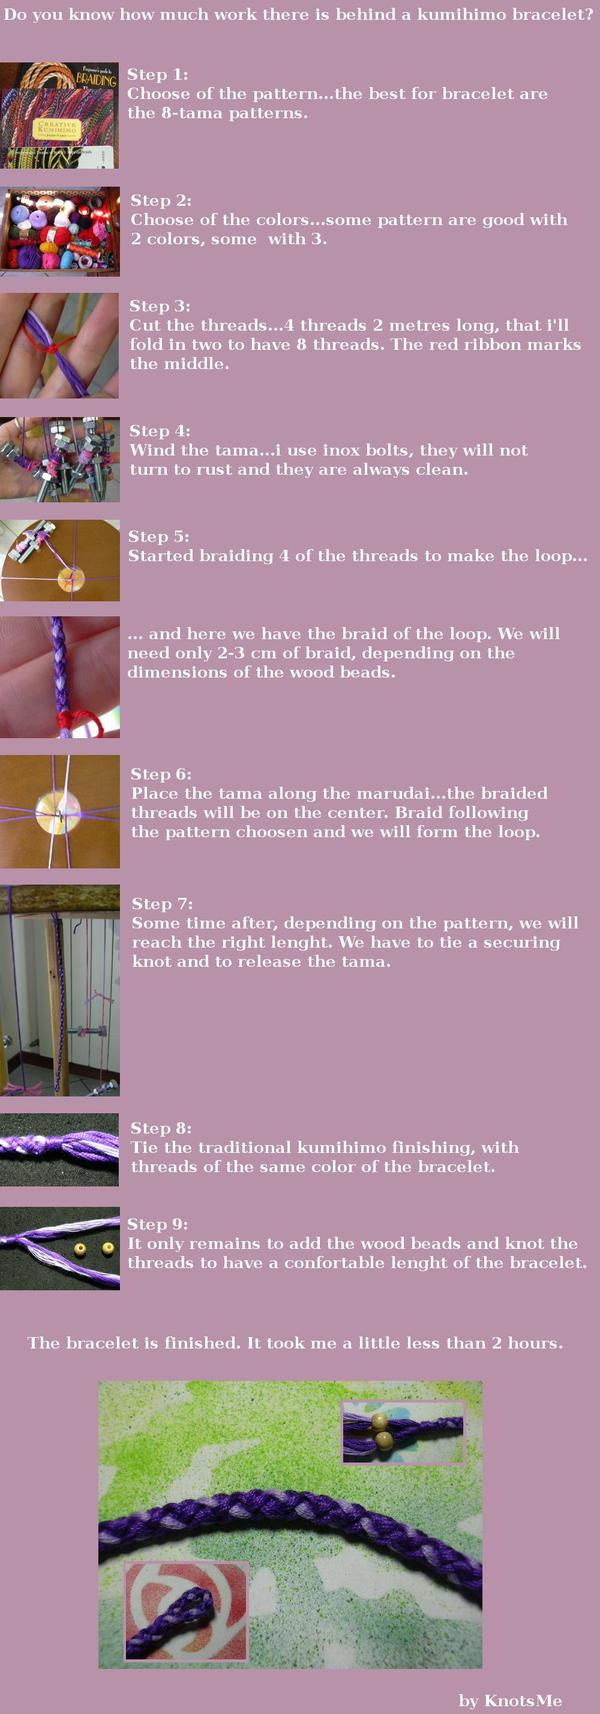 Kumihimo bracelet tutorial by knotsme